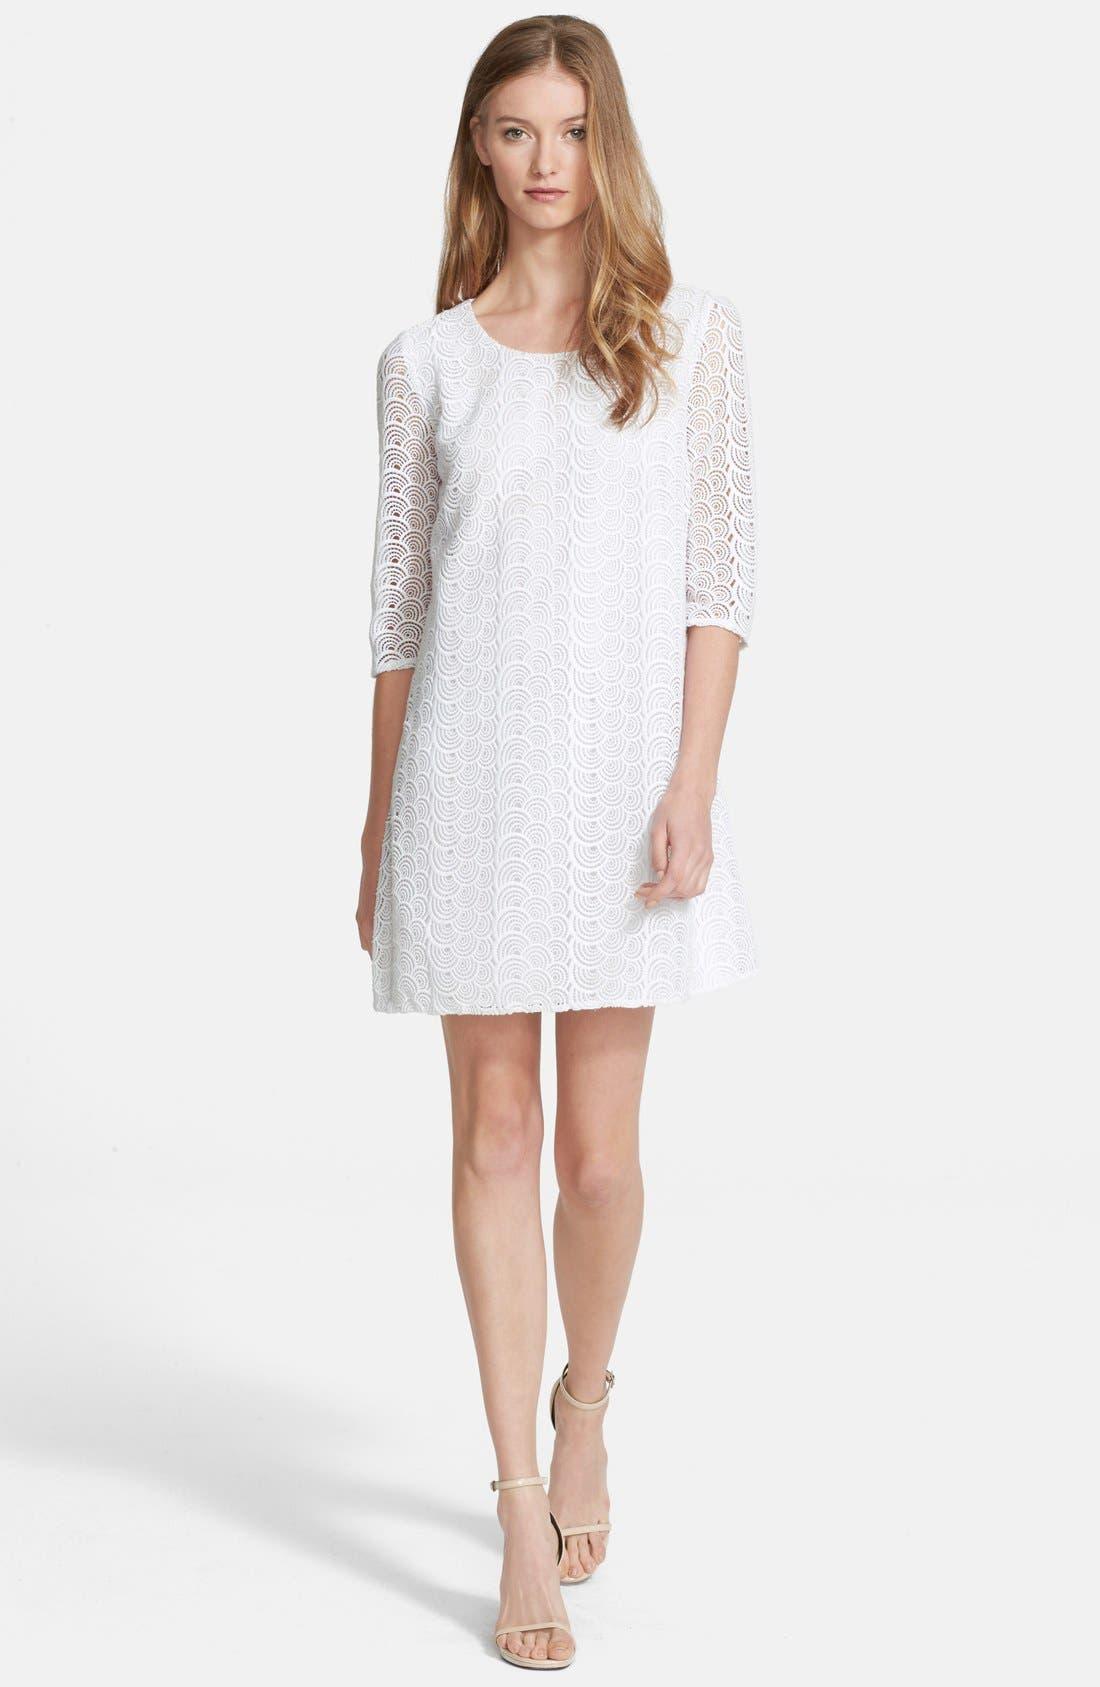 Alternate Image 1 Selected - Diane von Furstenberg 'Martina' Lace Shift Dress